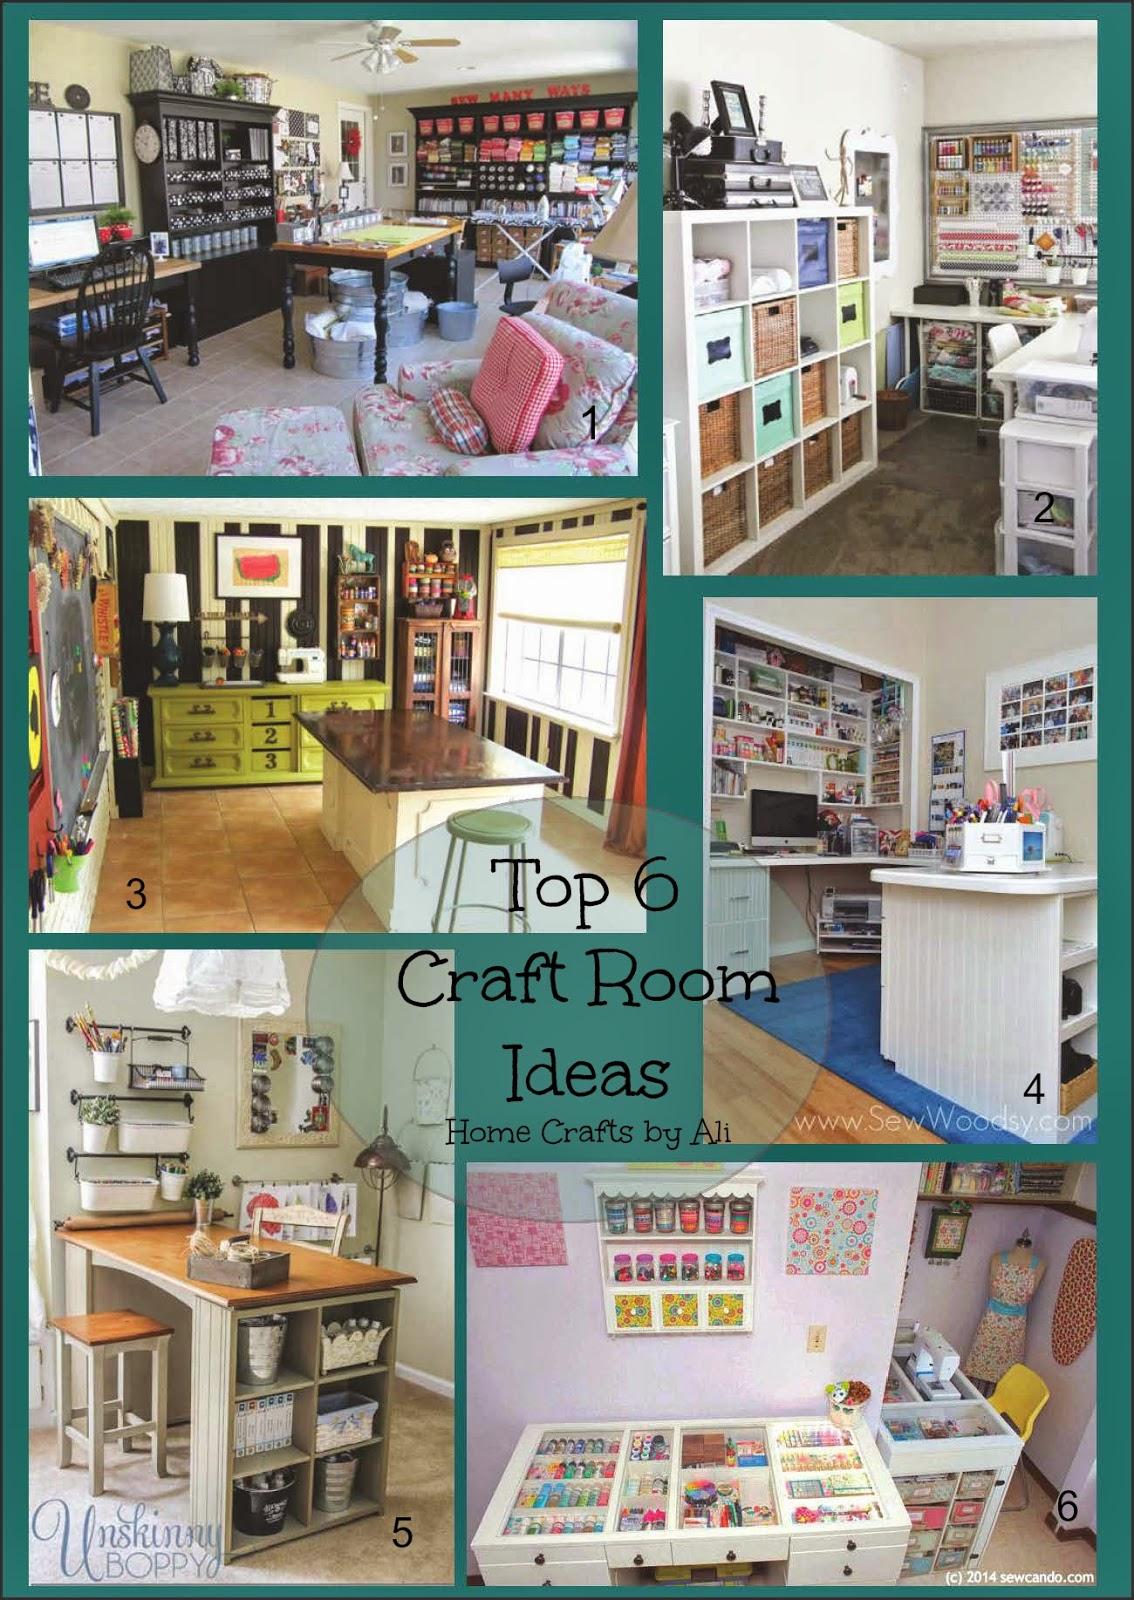 Best Craft Room Designs: Top 6 Craft Room Ideas